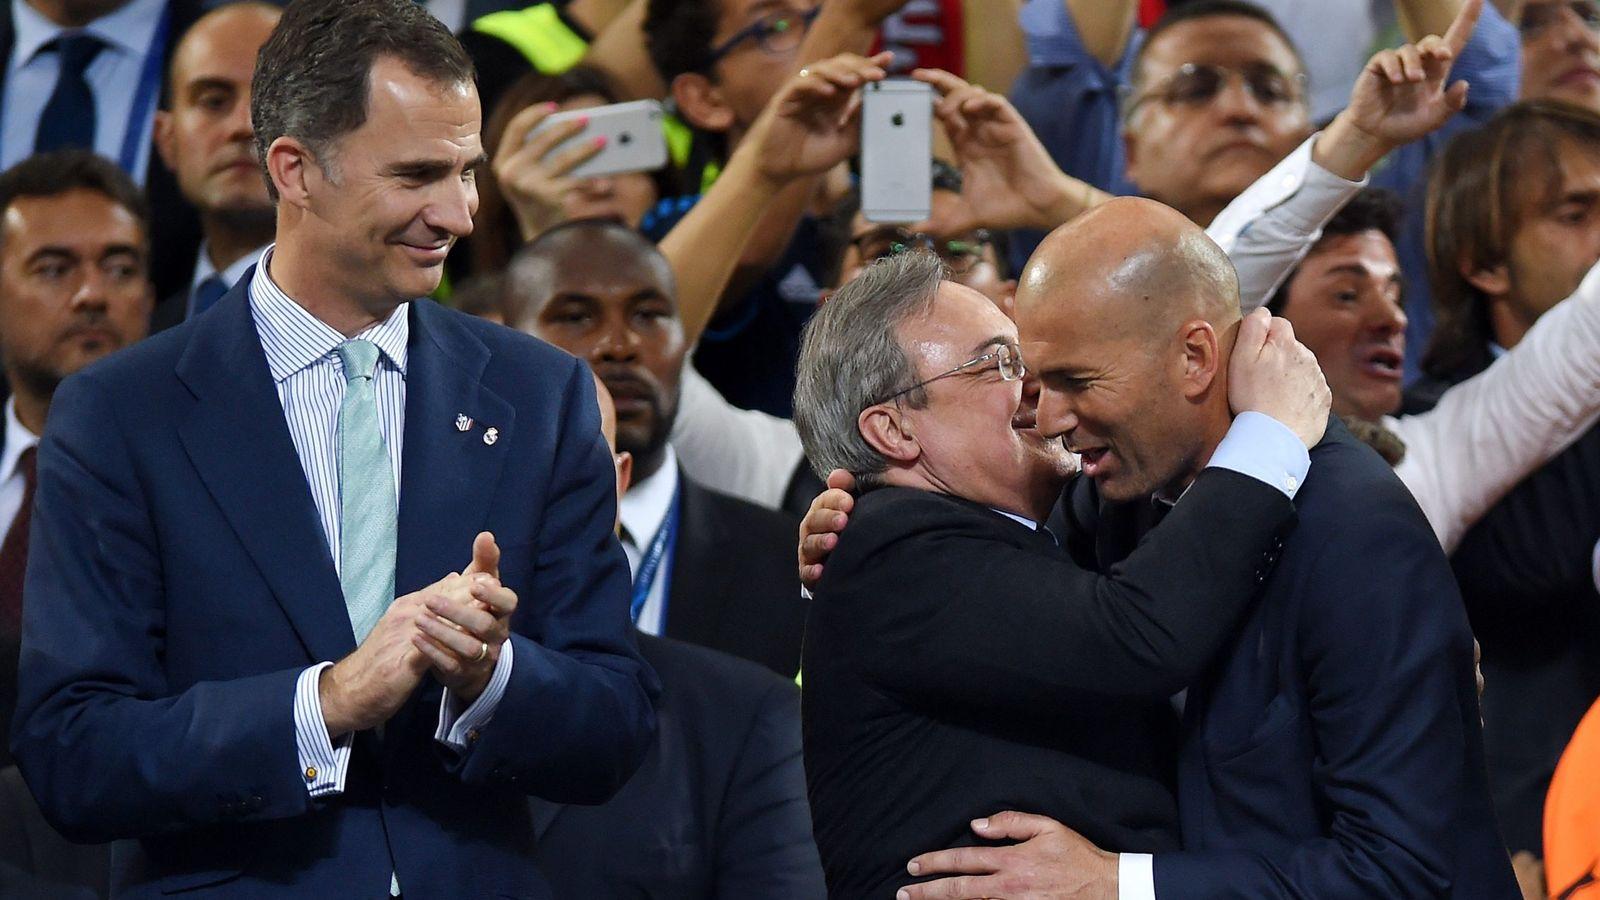 Foto: Pérez se abraza a Zidane ayer, en Milán, en presencia de Felipe VI. (EFE)